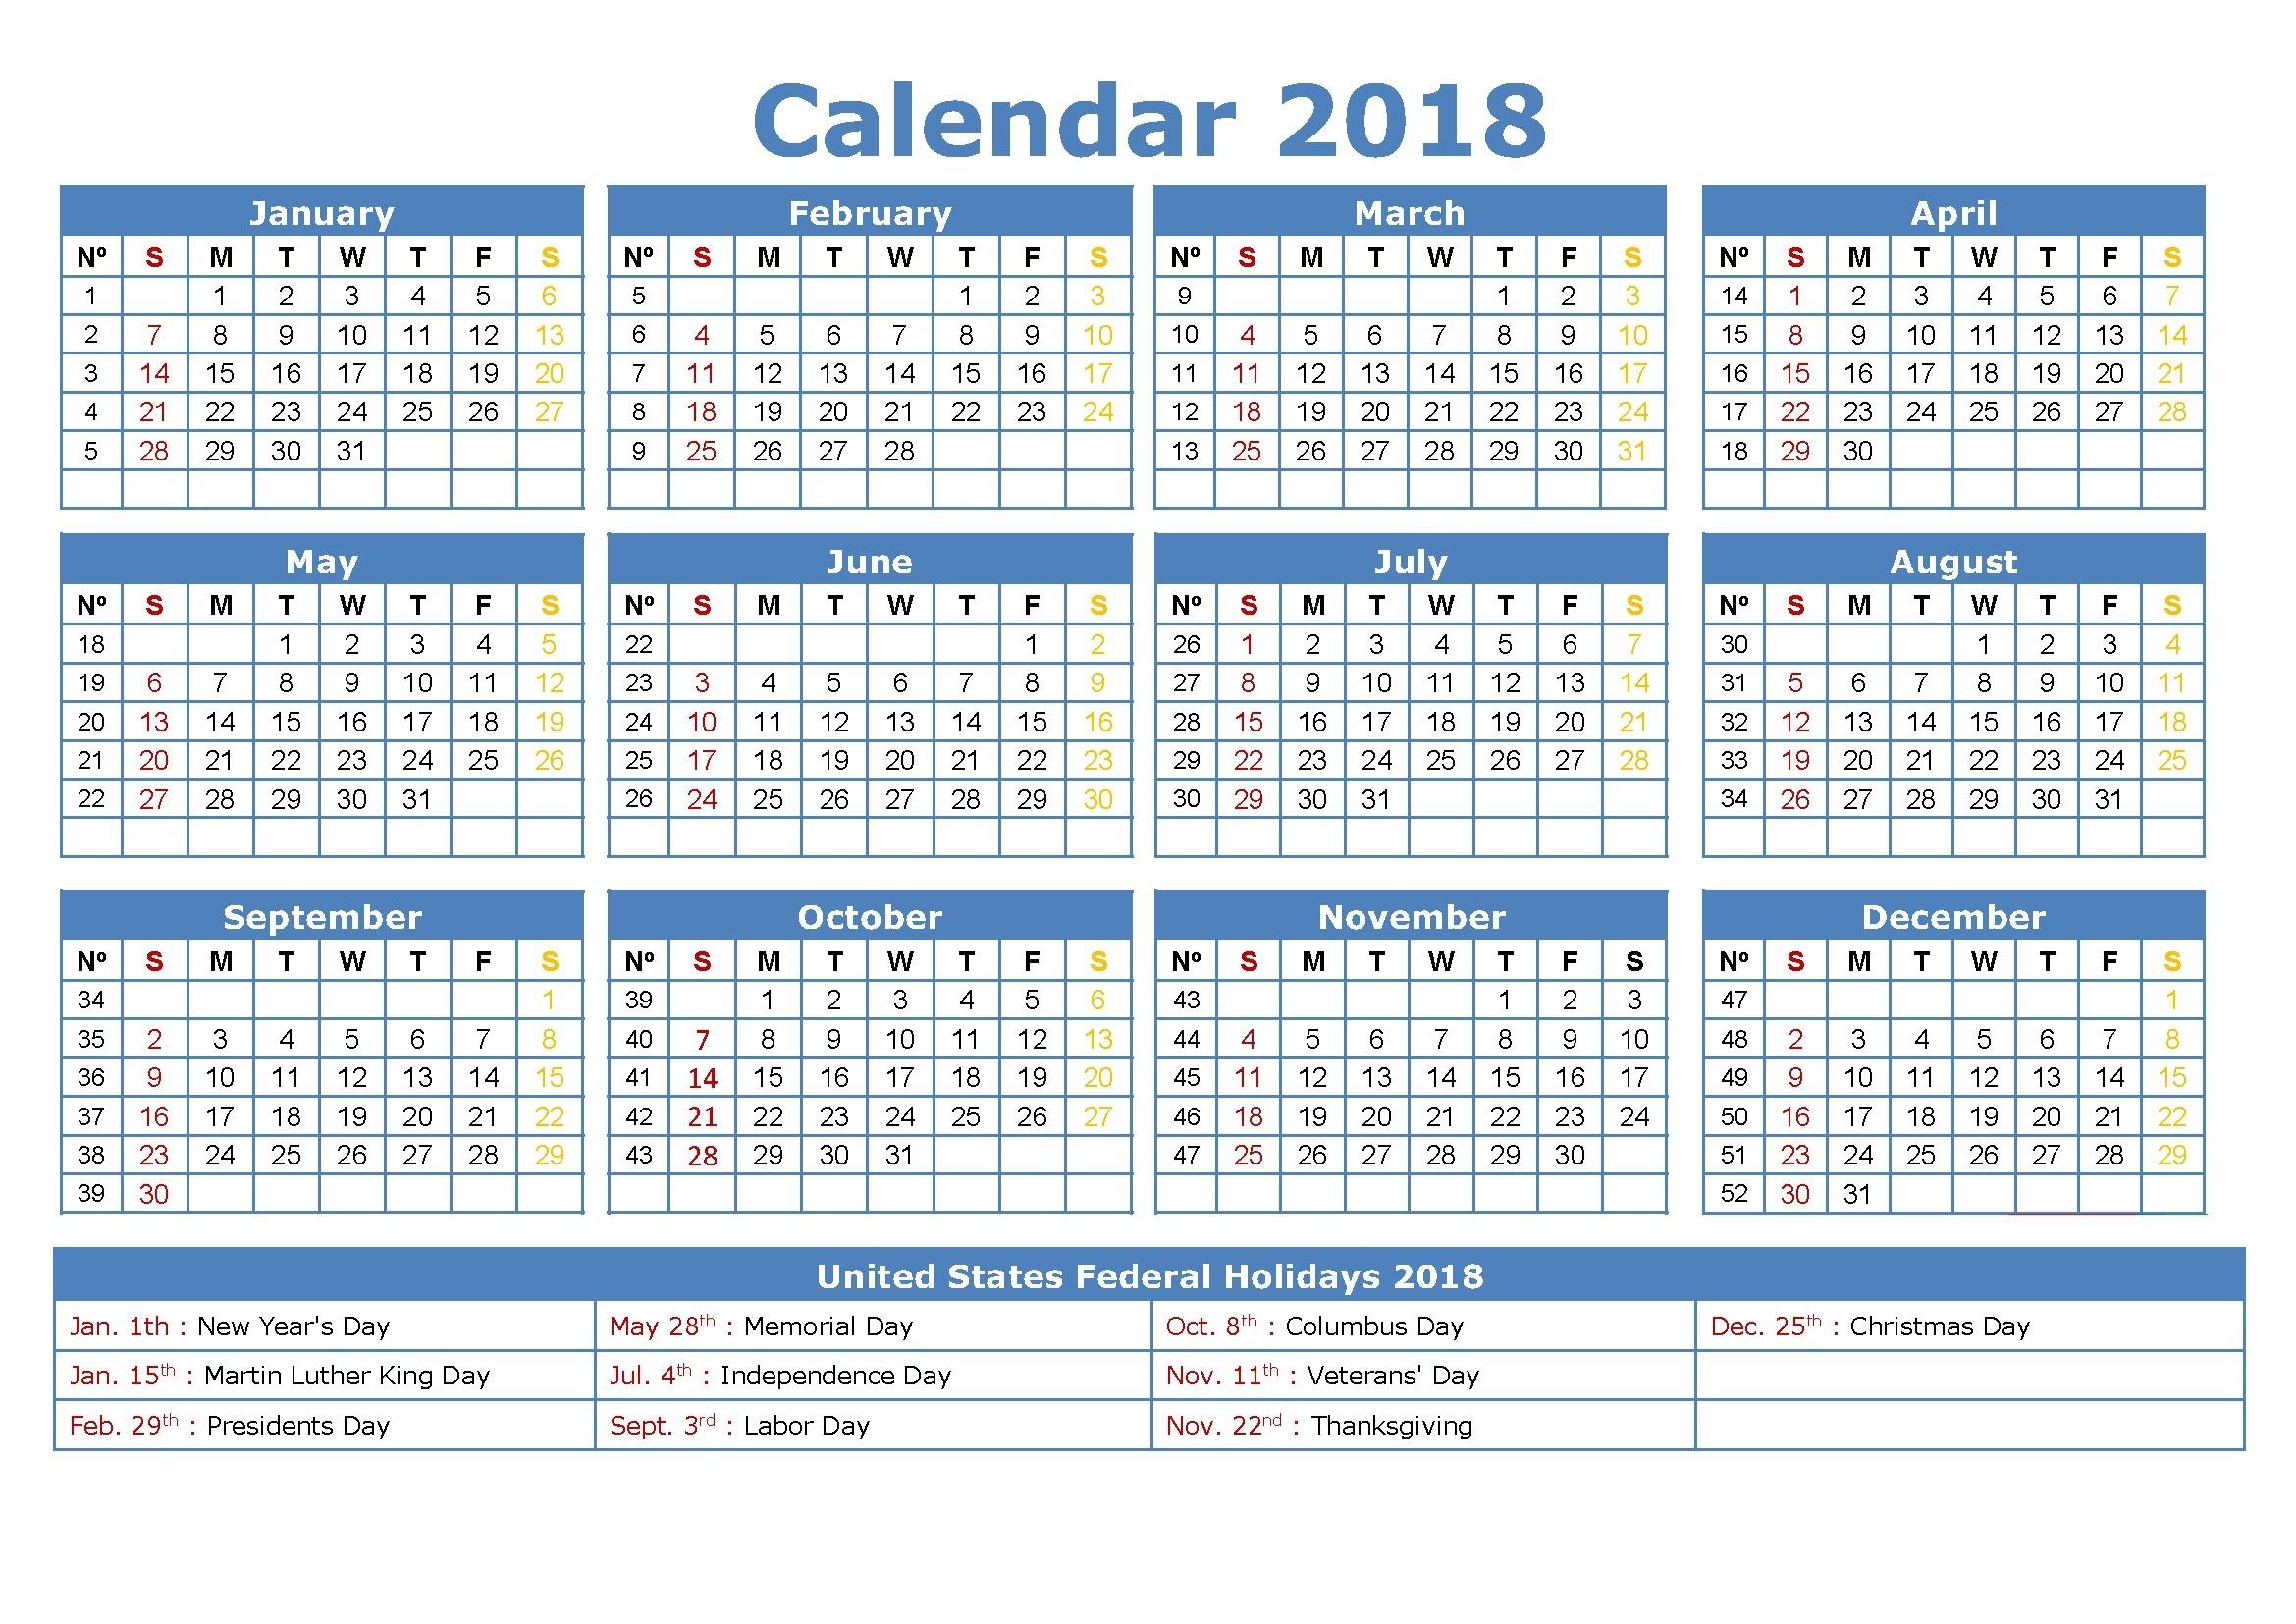 Free Printable Employee Attendance Calendars - Calendar